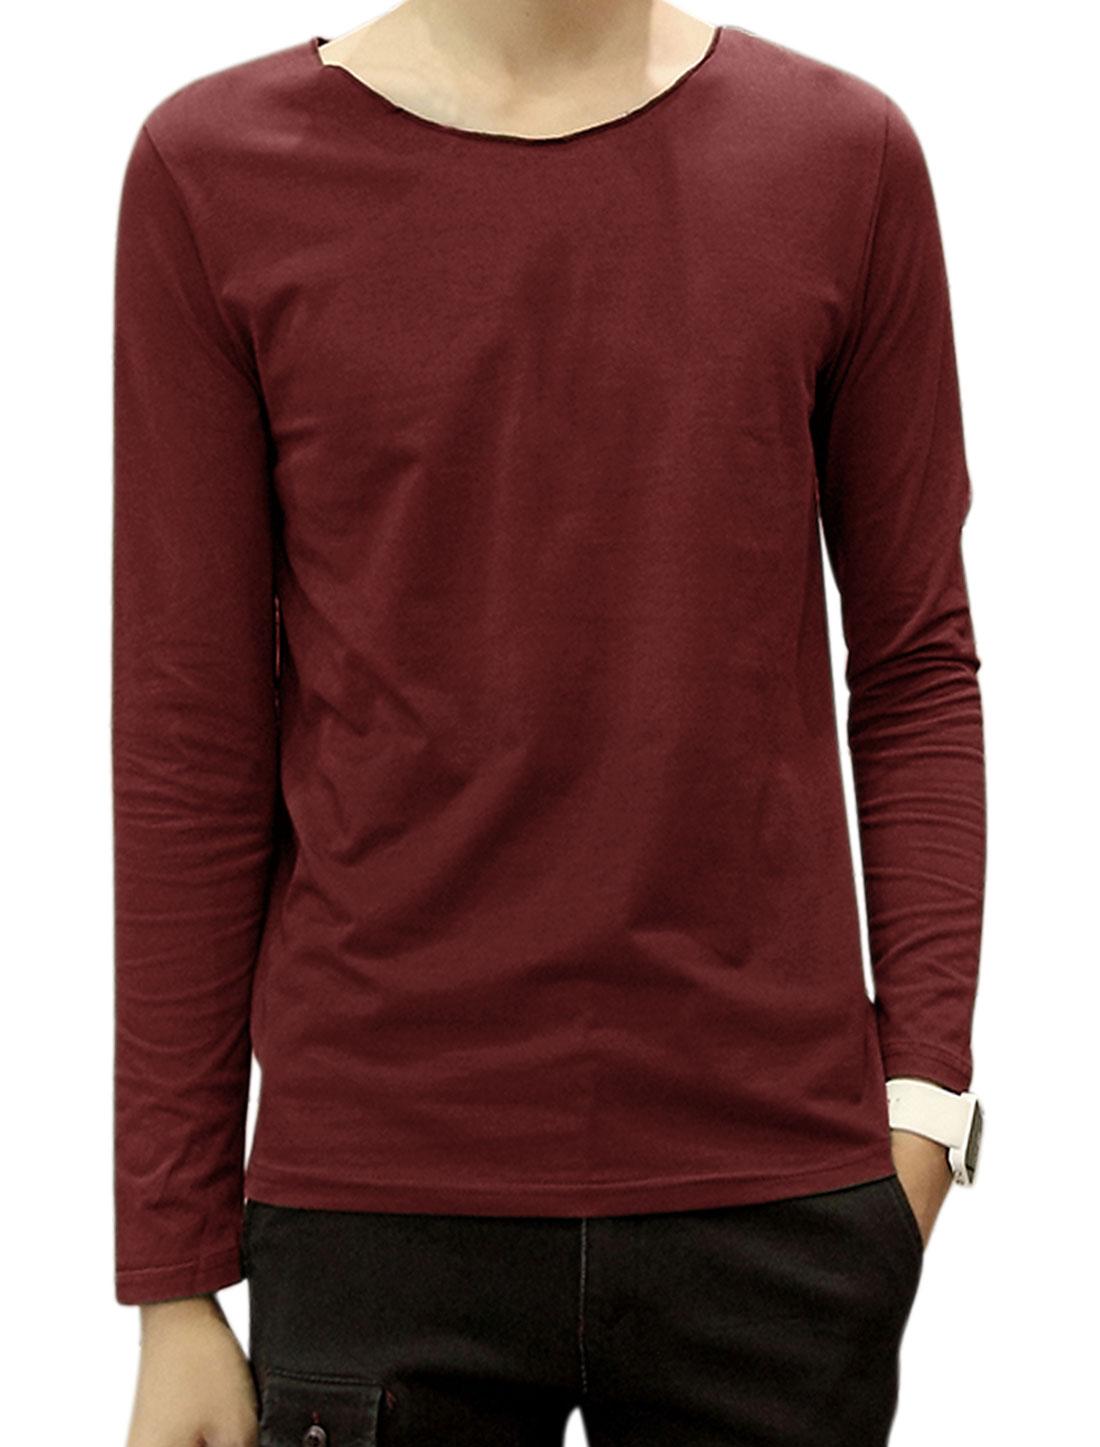 Men Raw Edge Neckline Long Sleeves Round Neck Tee Shirt Red M